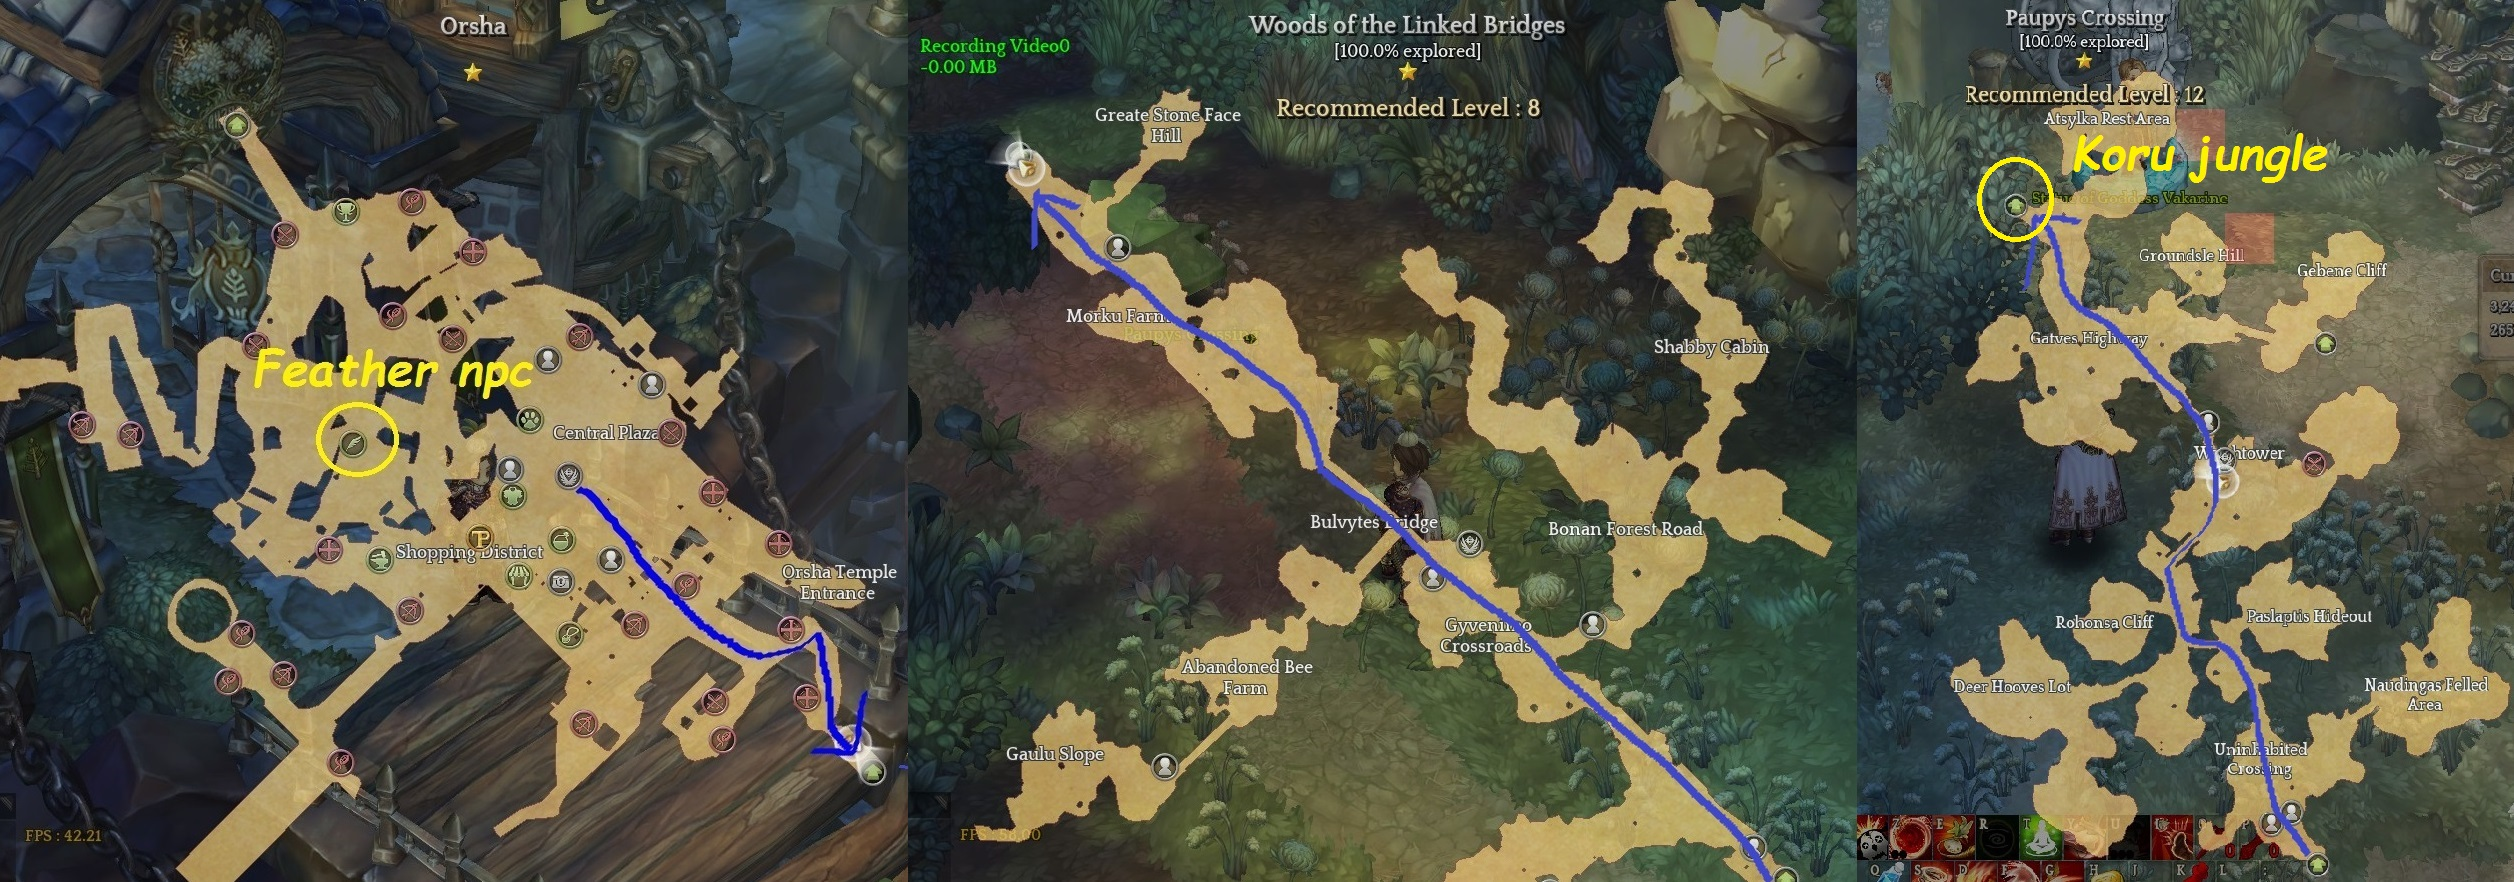 tos how to get to koru jungle